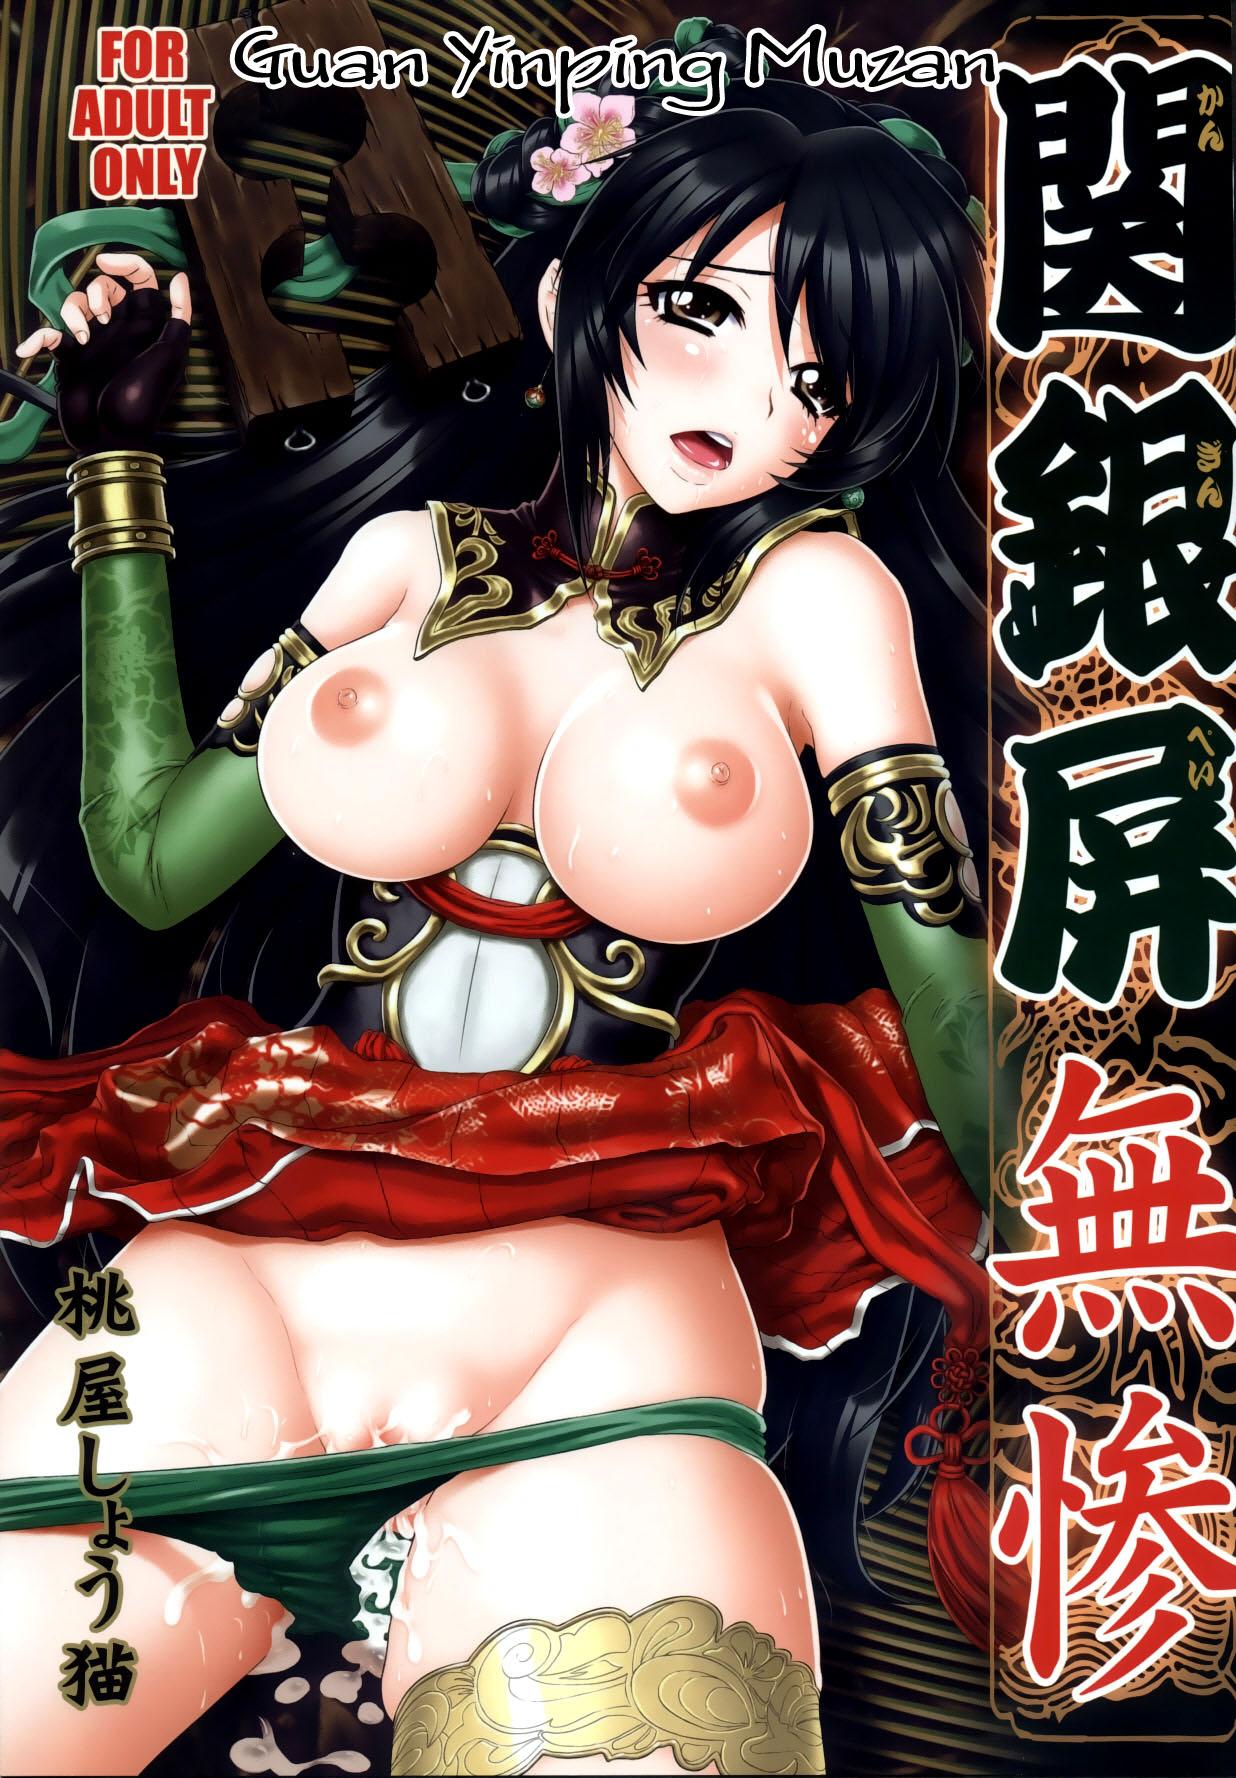 Jungle warrior ryona hentai exposed videos